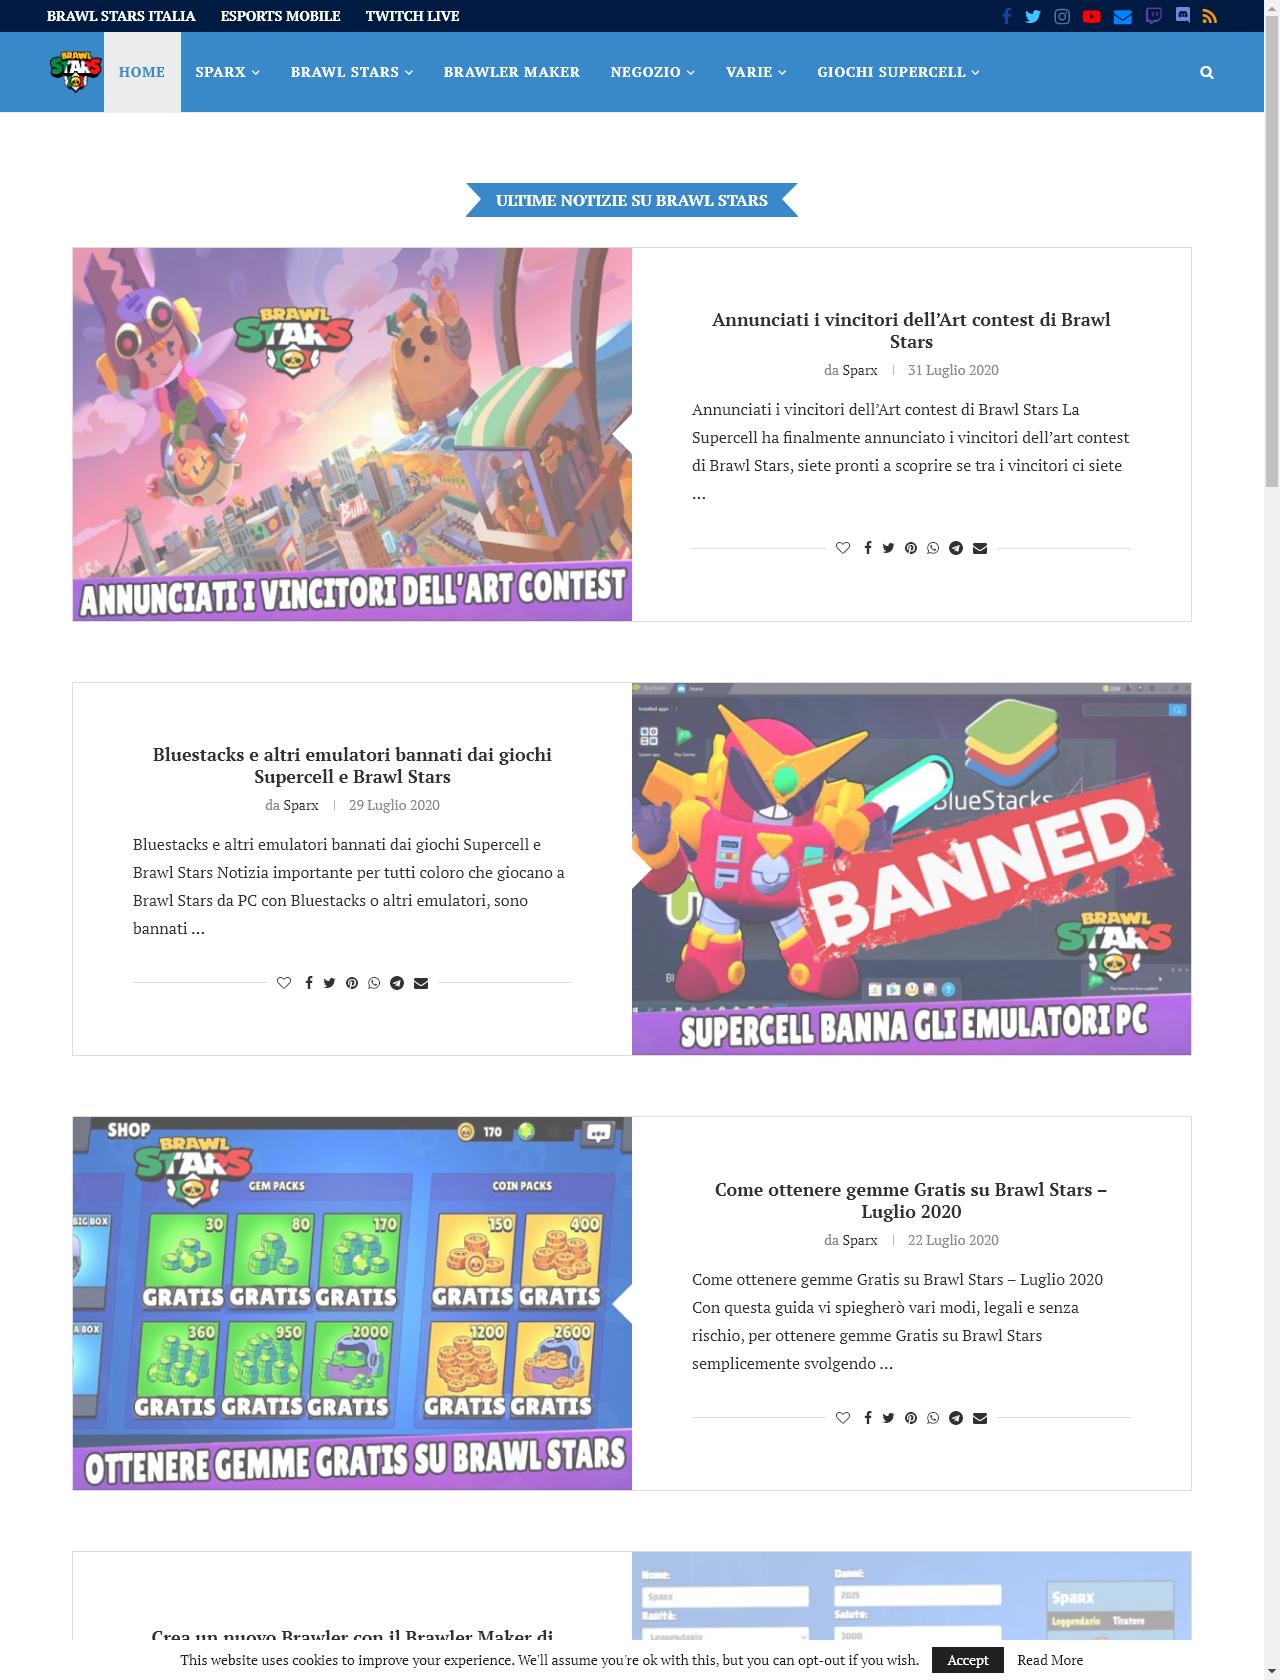 Screenshot Desktop - https://www.brawlstarsitalia.com/